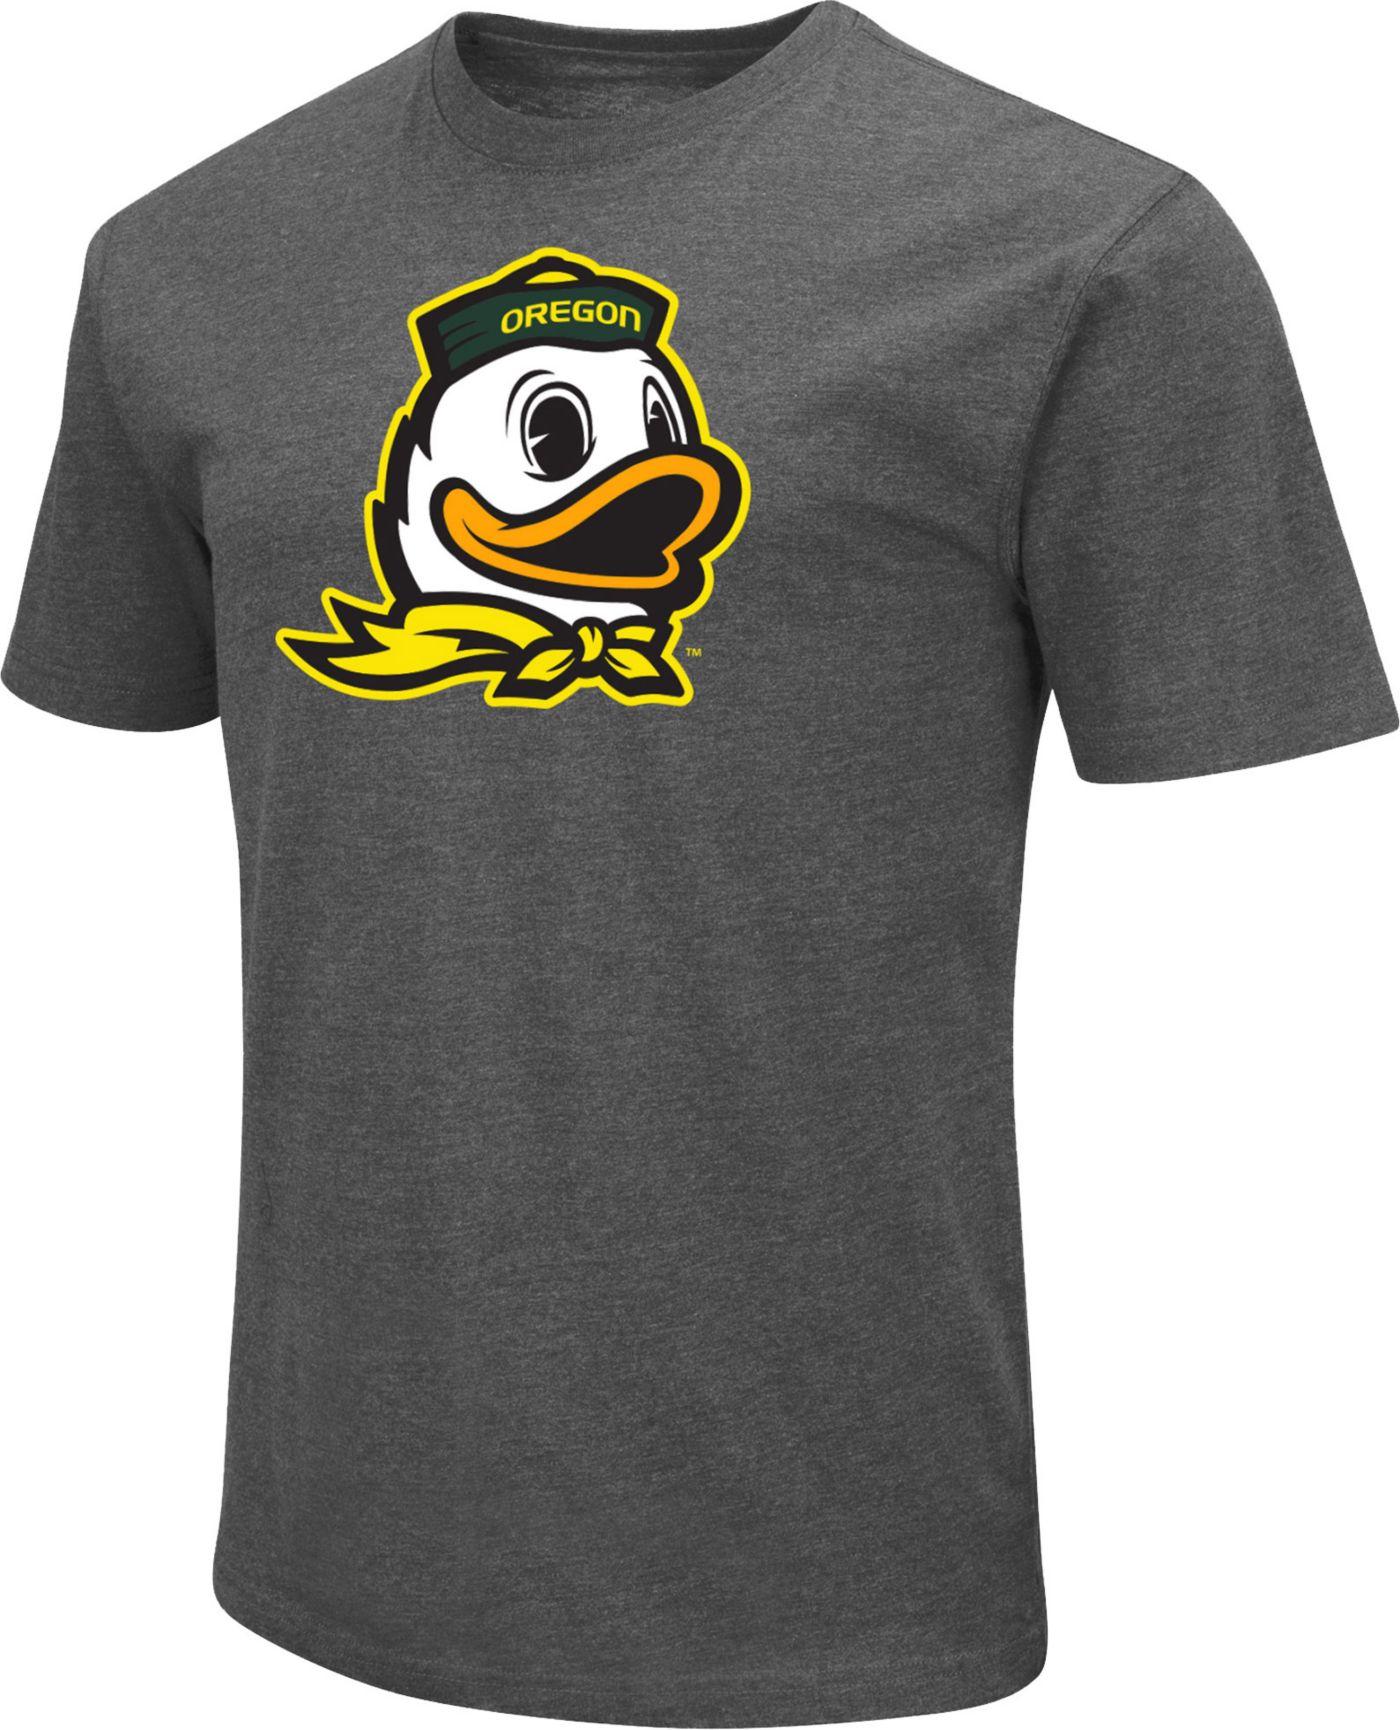 Colosseum Men's Oregon Ducks Grey Dual Blend T-Shirt